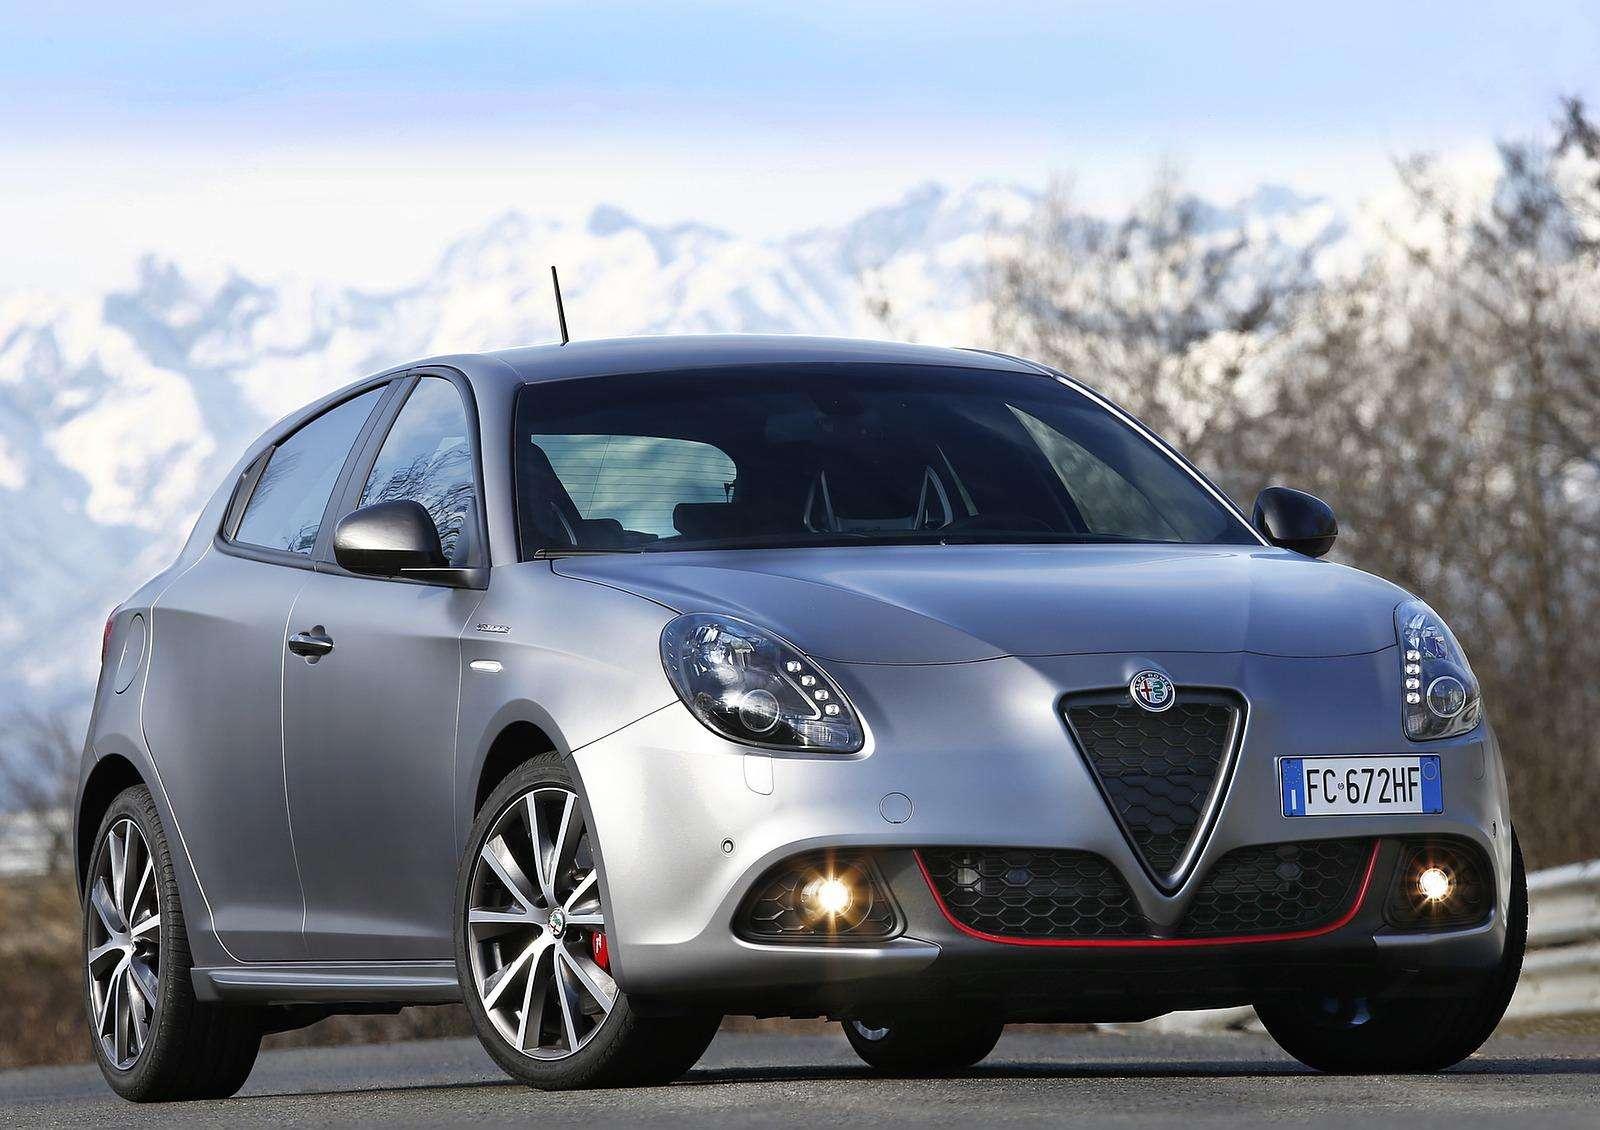 alfa romeo giulietta - Alfa Romeo Giulietta 1.6 120CV EU6